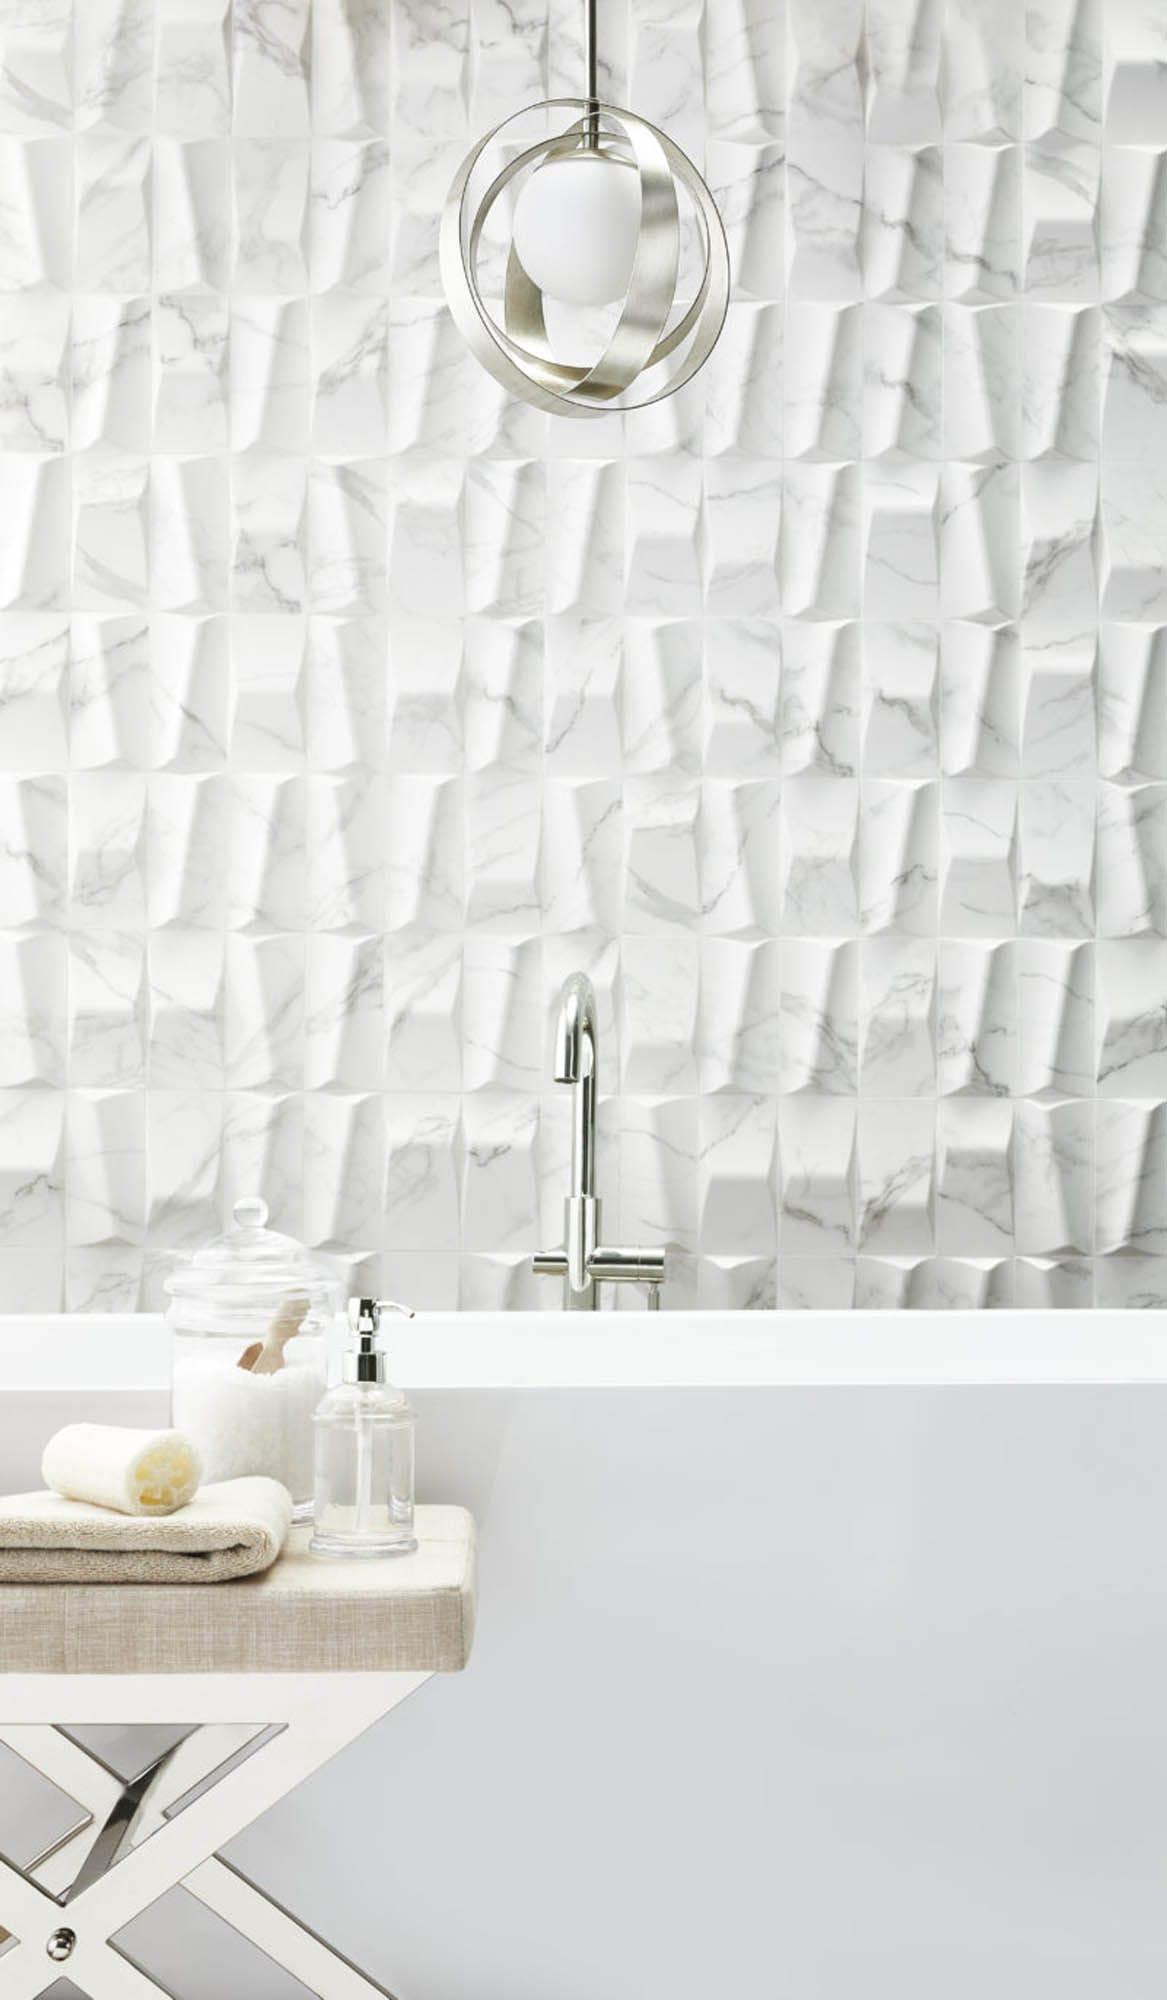 Dimensional white wall tiles